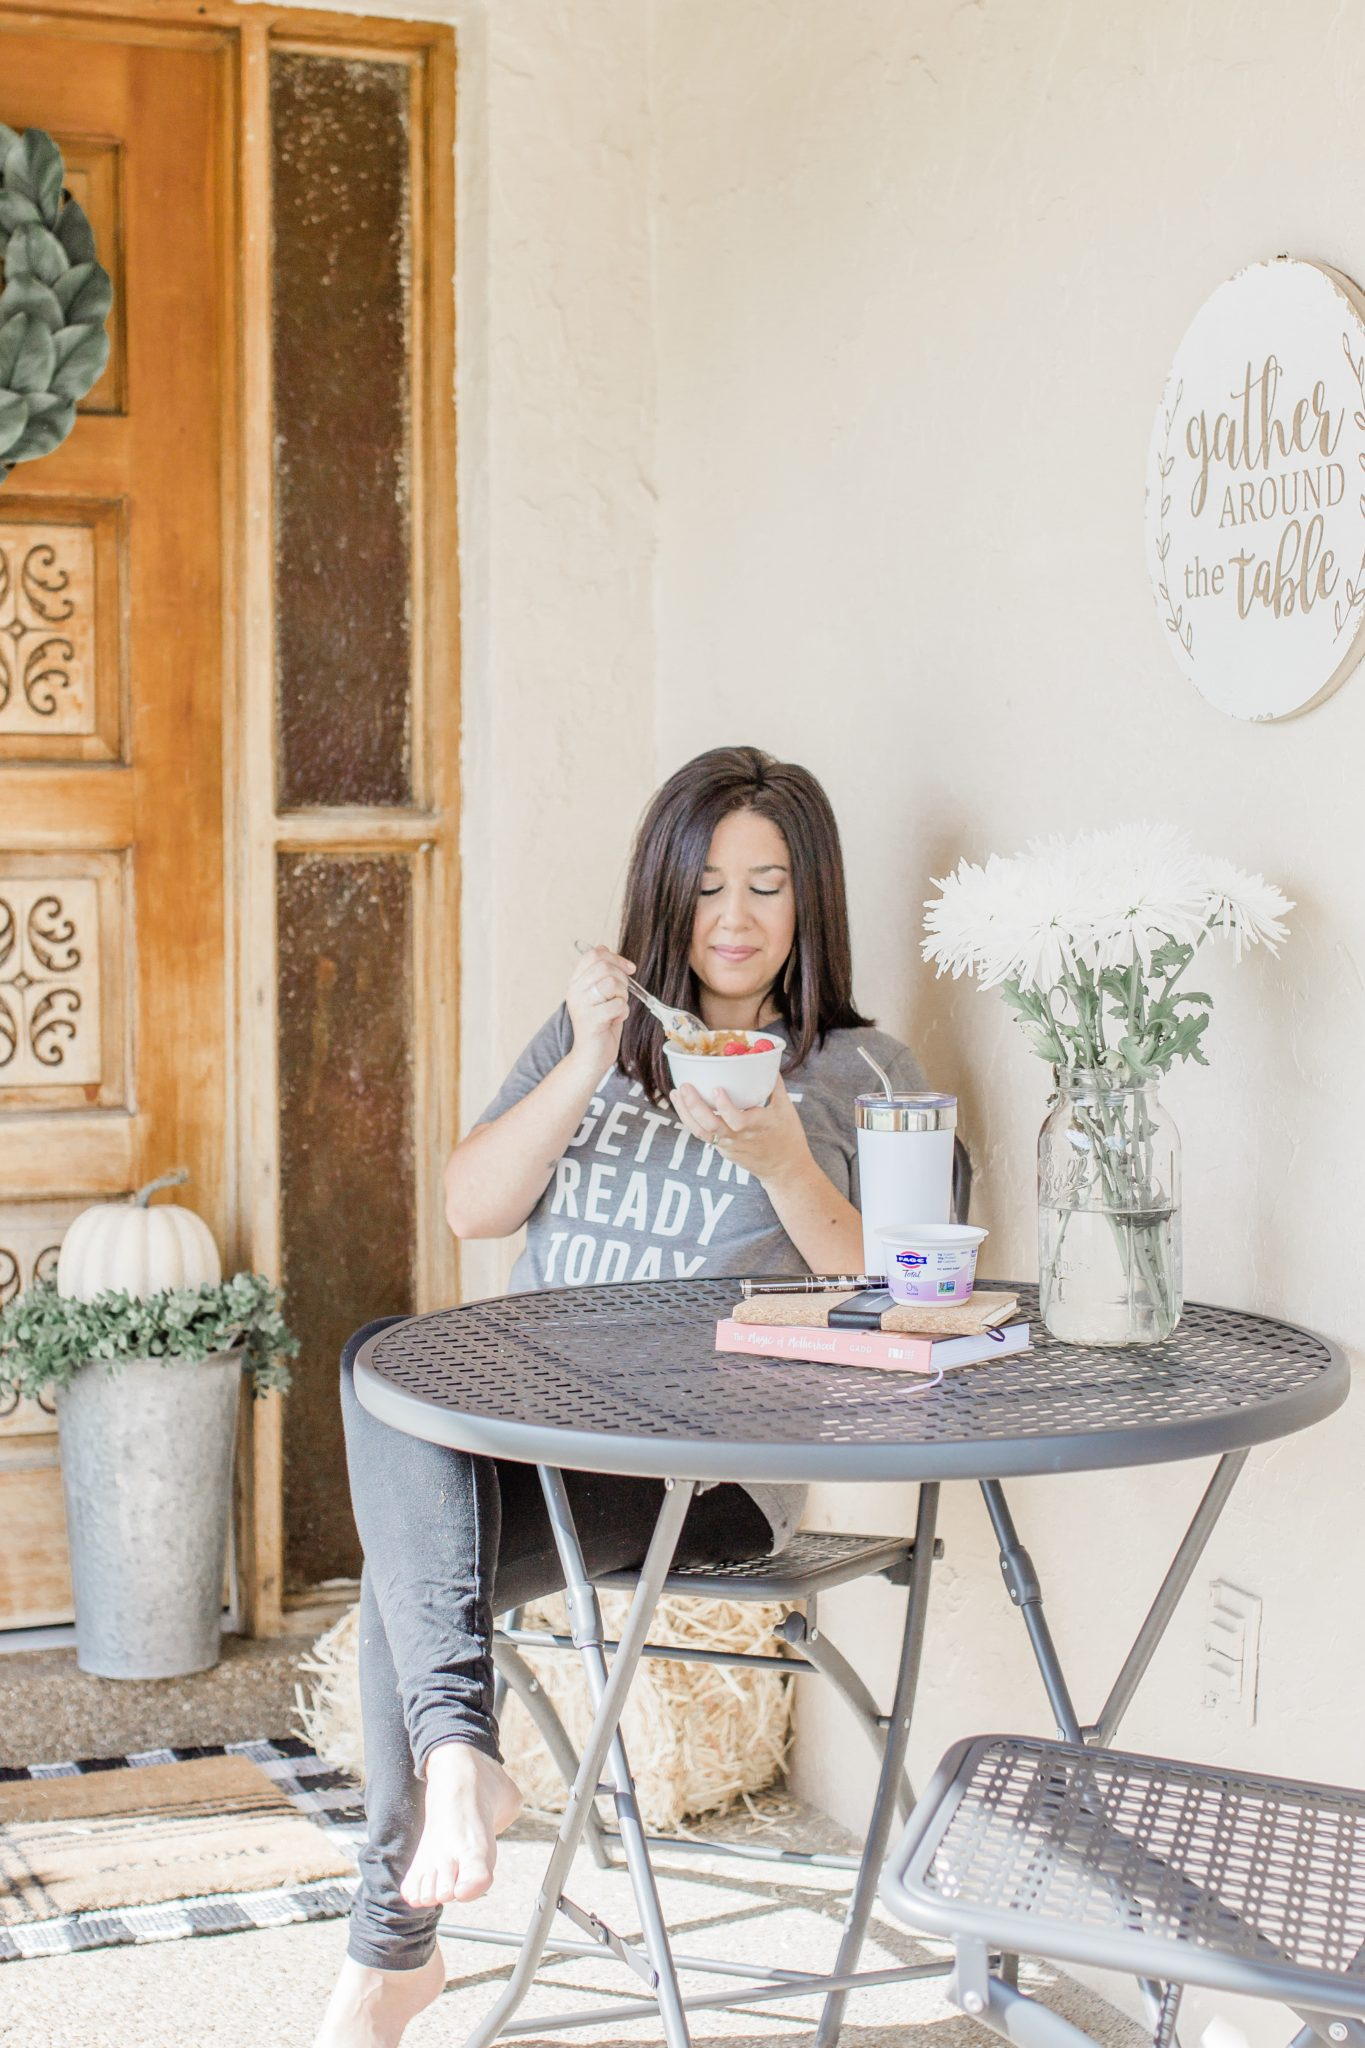 #ad #FageYourWay Tampa parenting blog mothers blog motherhood blog Florida travel blogger travel influencer healthy mom blogger spring hill florida lifestyle parenting blog best mom blog 2018